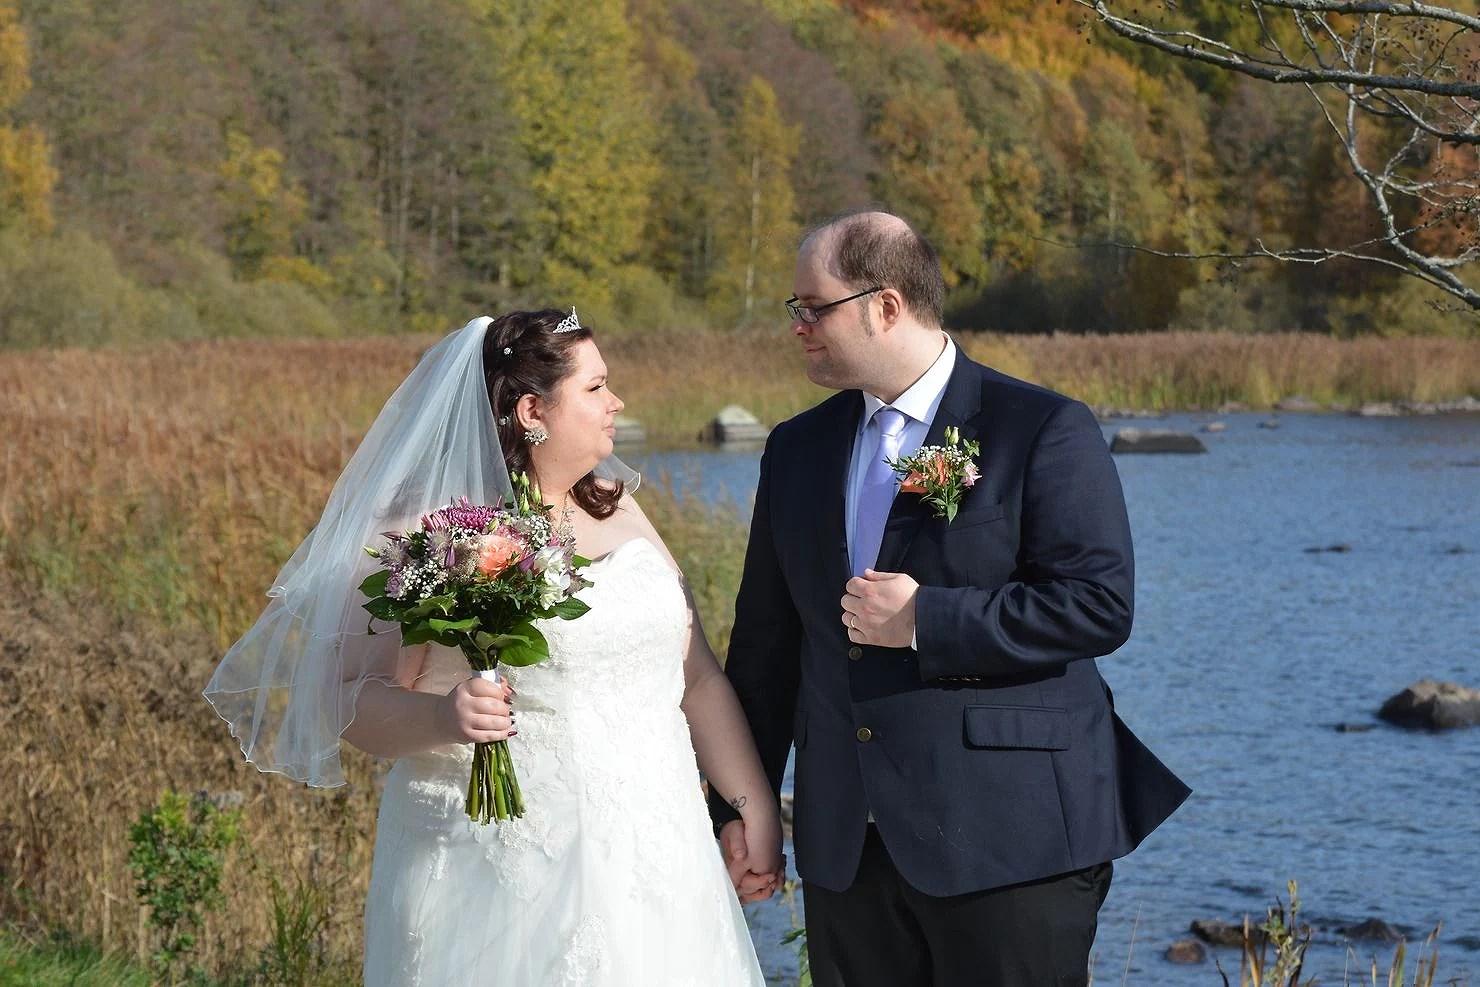 Bröllopet - Natur bilder